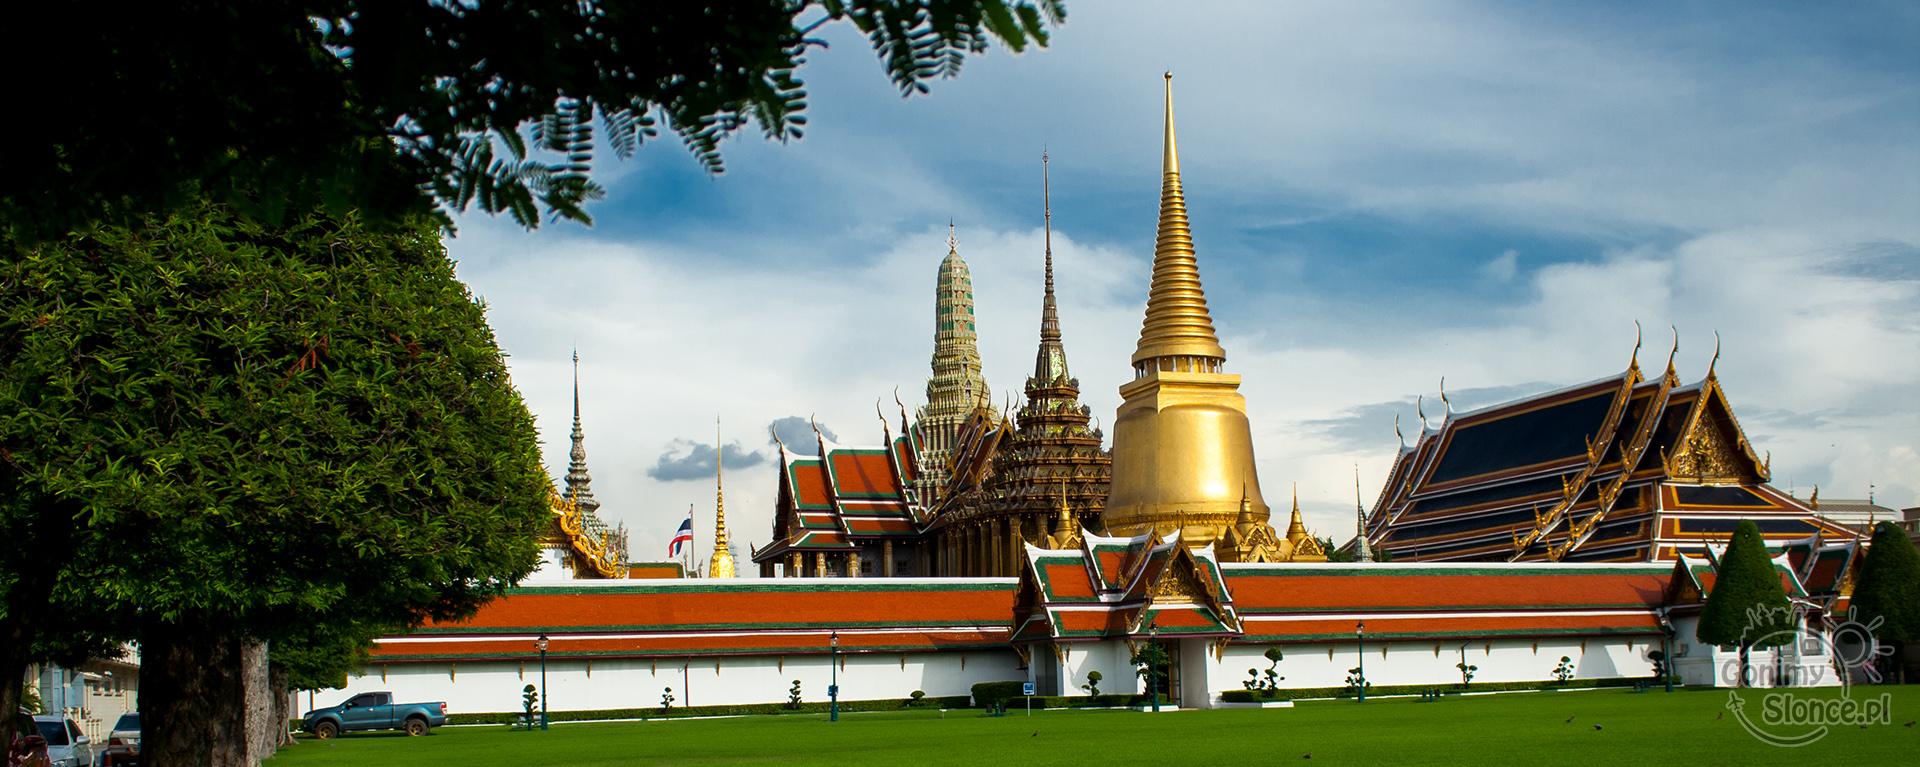 Wat Phra Kaew i Pałac w Bangkoku